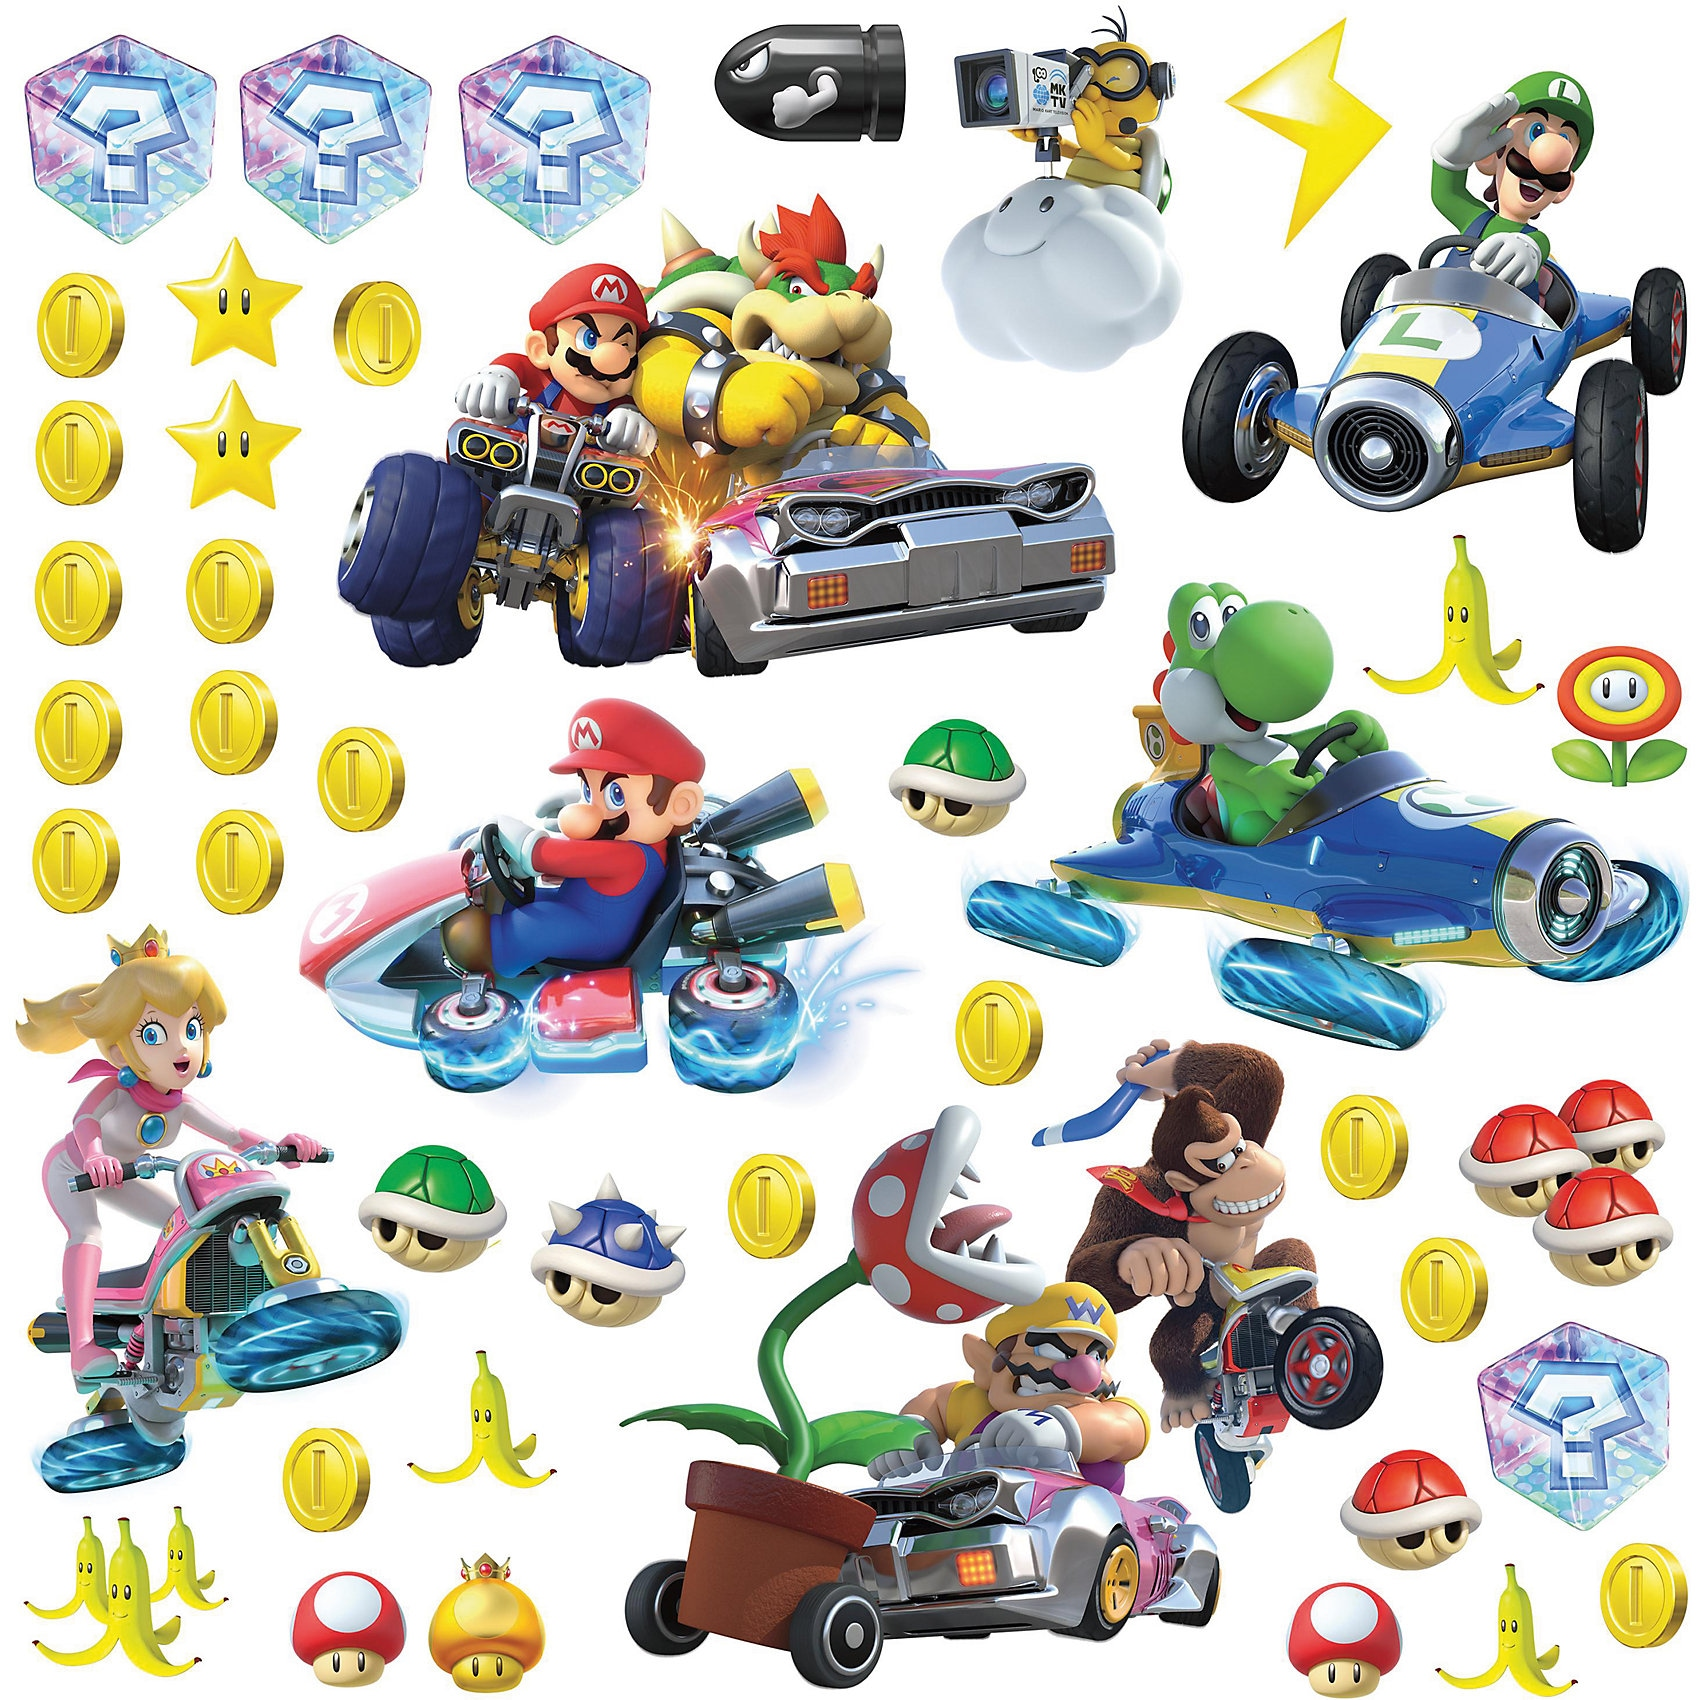 RoomMates Wandsticker Nintendo Mario Kart 8 mehrfarbig